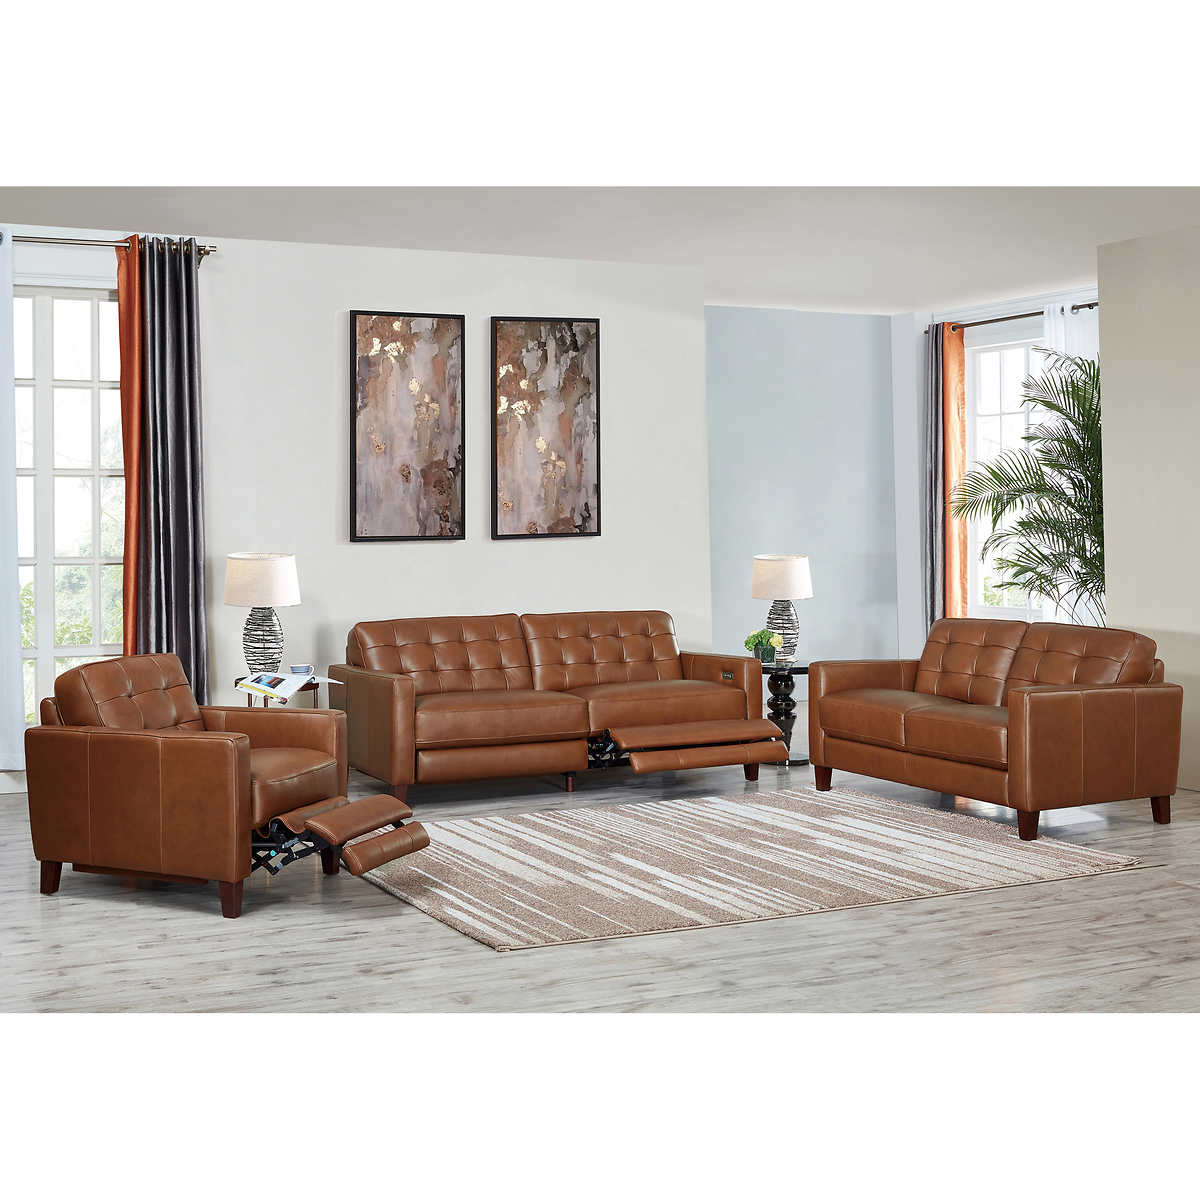 Art Origin Gordon Park Brown Modern Top Grain Leather 3 Piece Living Room Set